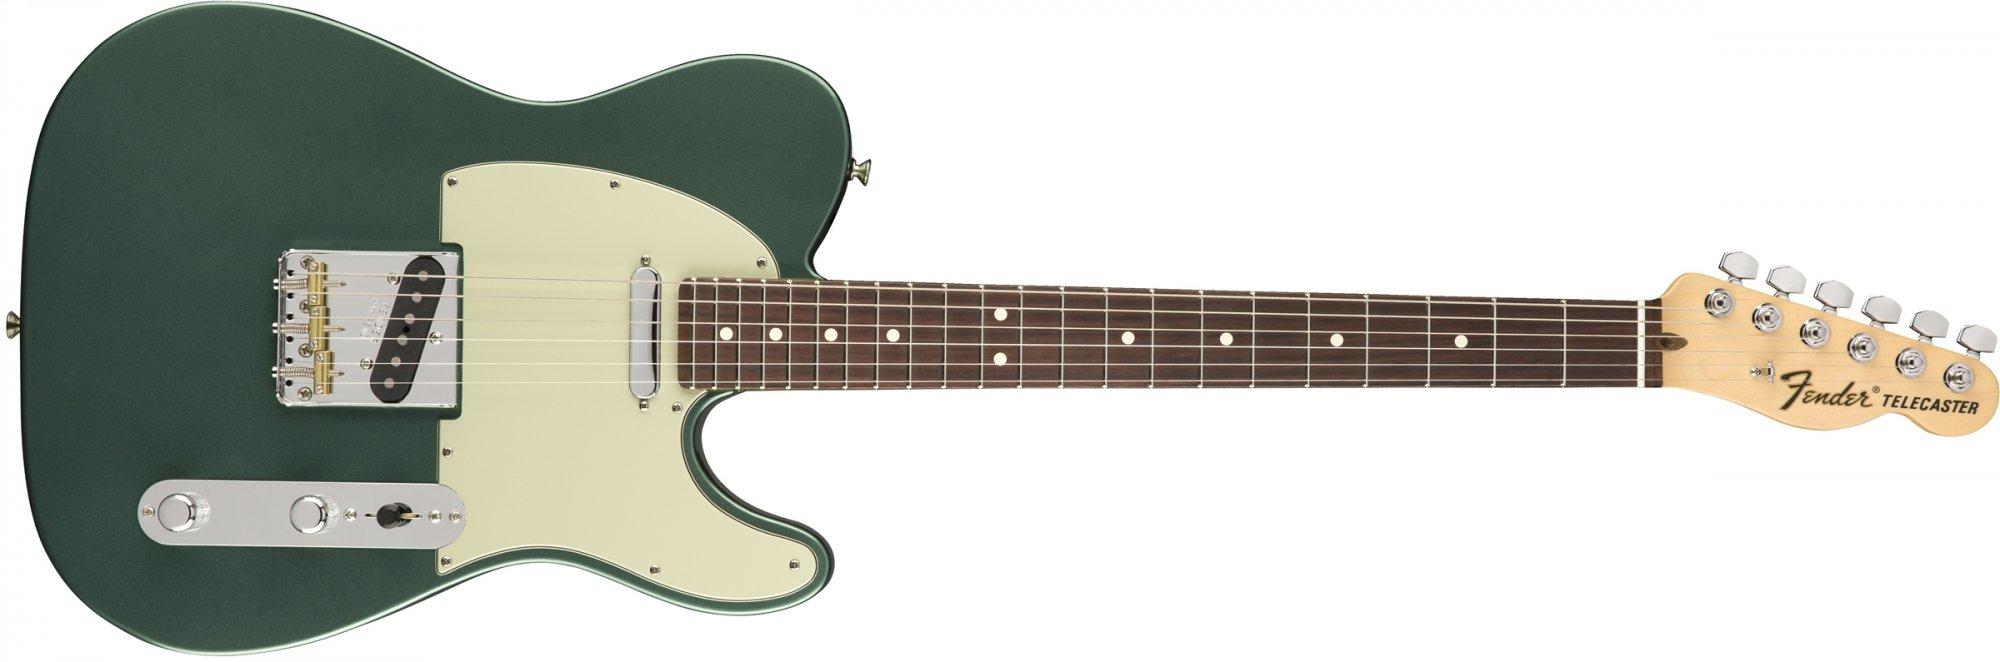 Fender American Special Telecaster RW Sherwood Green Metallic